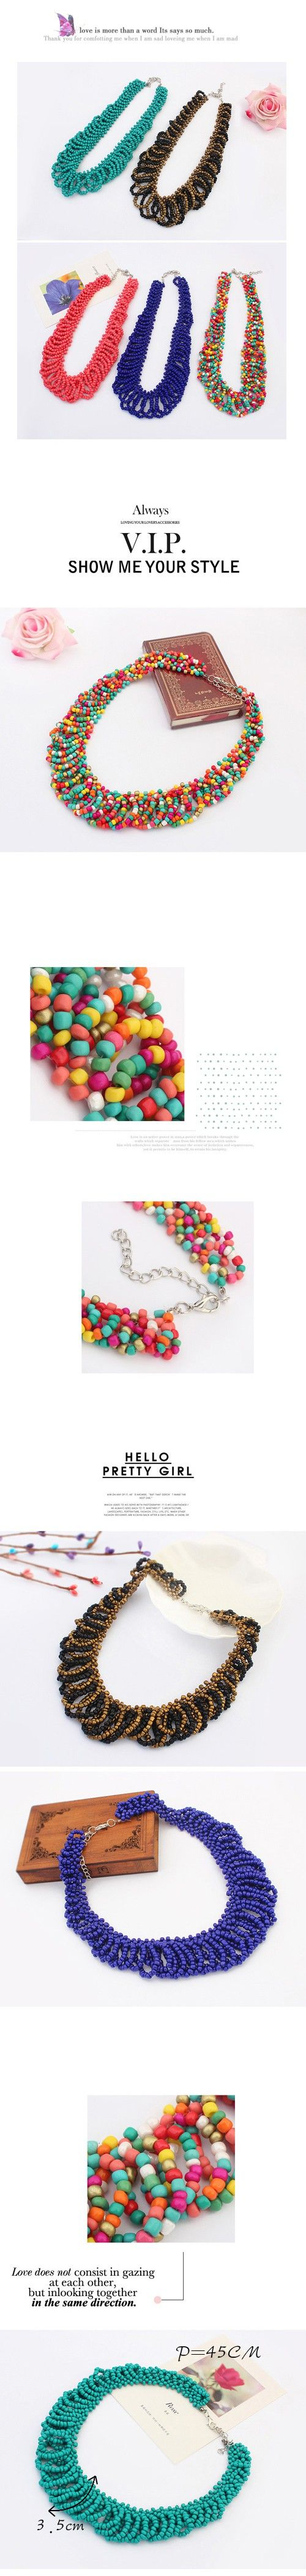 Define multicolor beads weave design alloy Korean Necklaces http://www.asujewelry.com